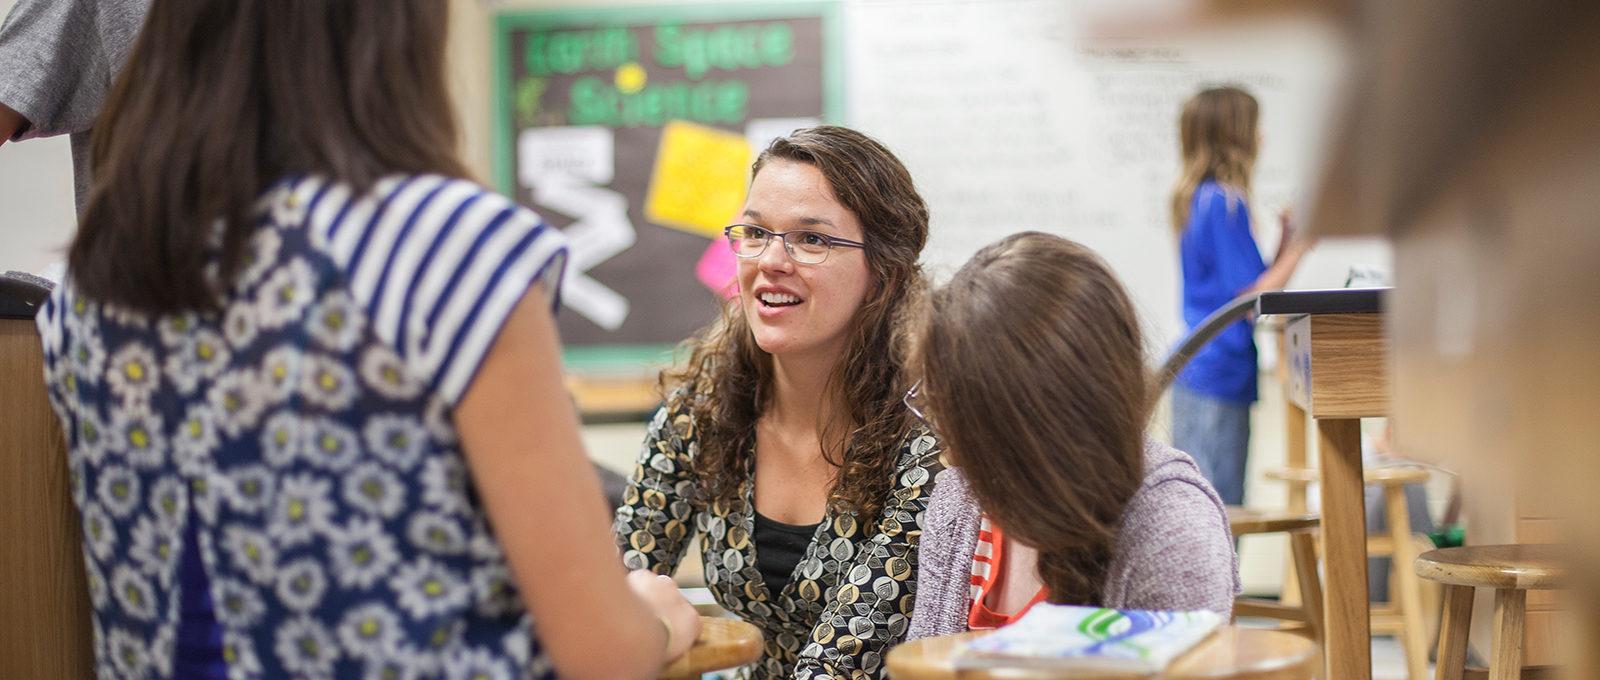 4th grade teacher alumna